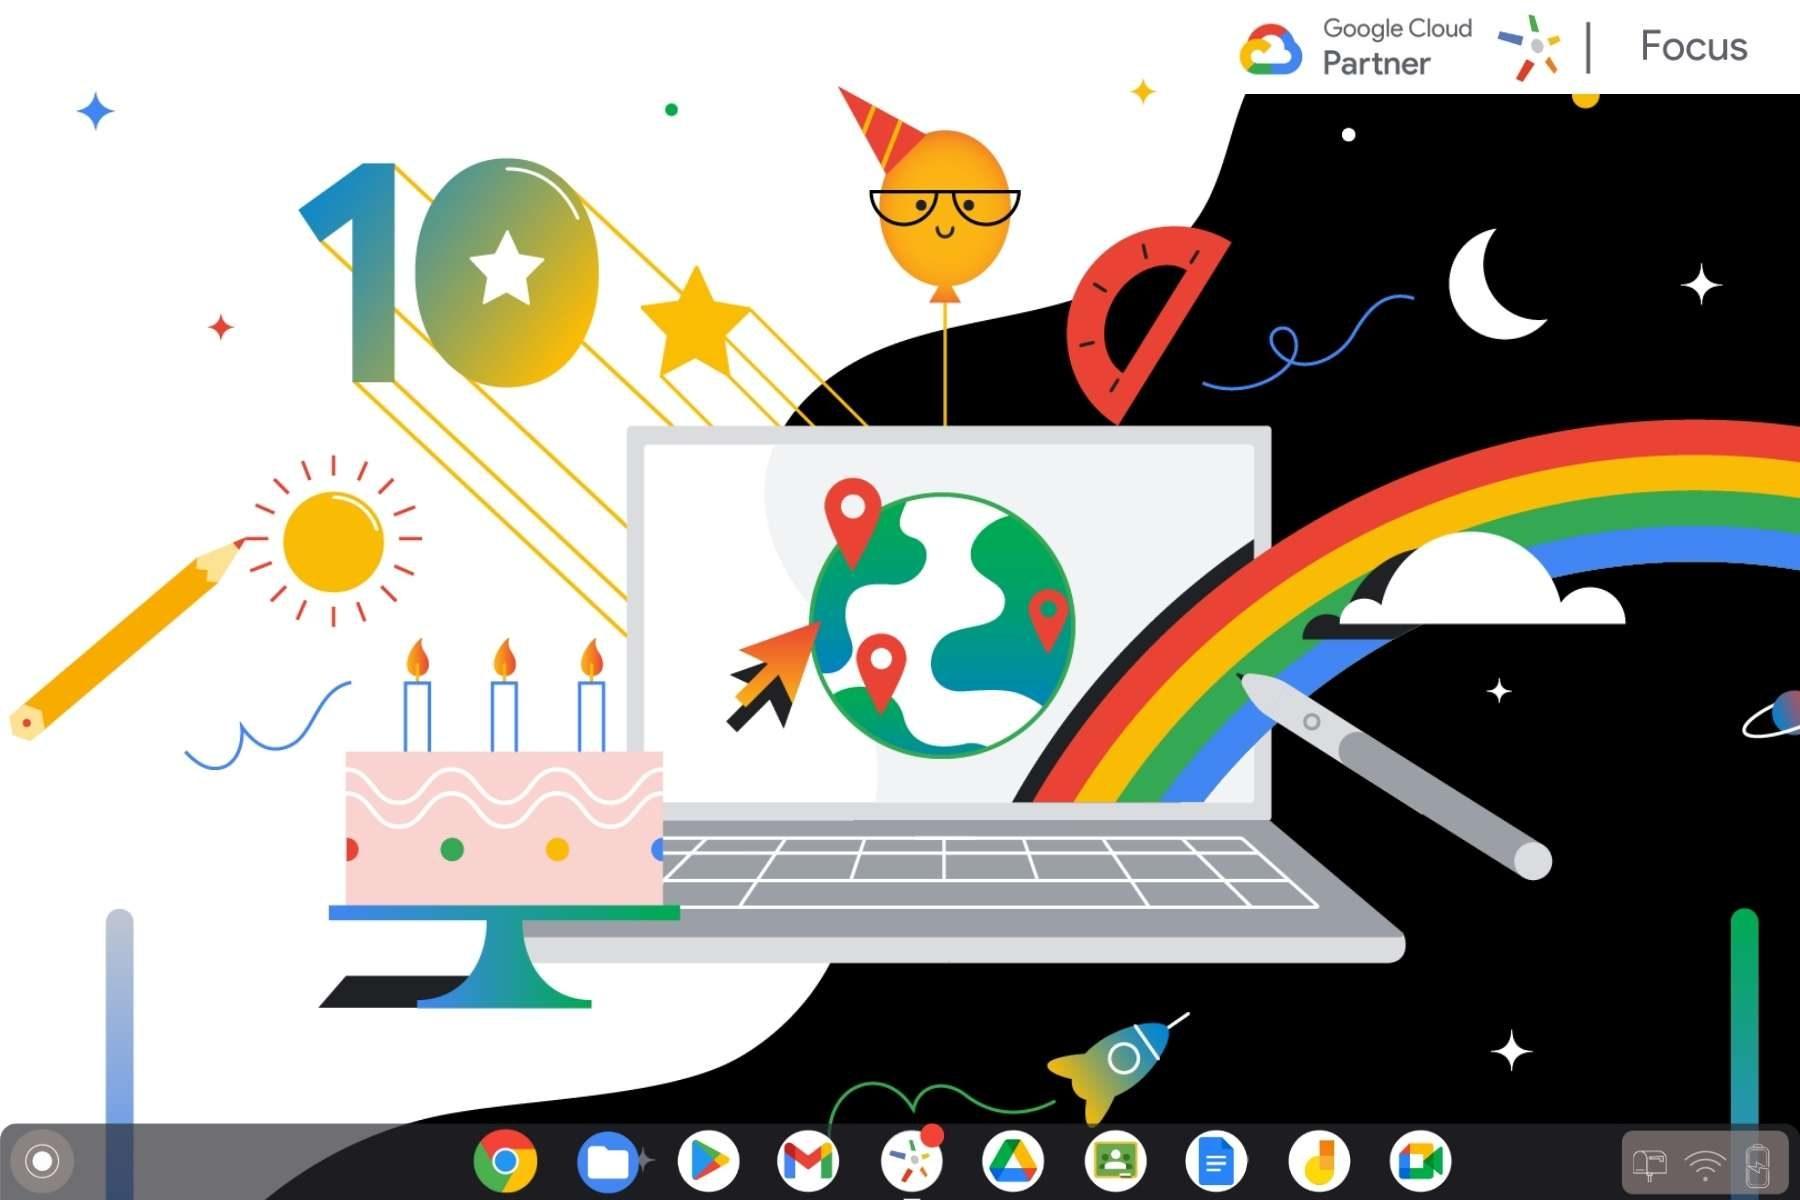 Joyeux anniversaire Chromebook !